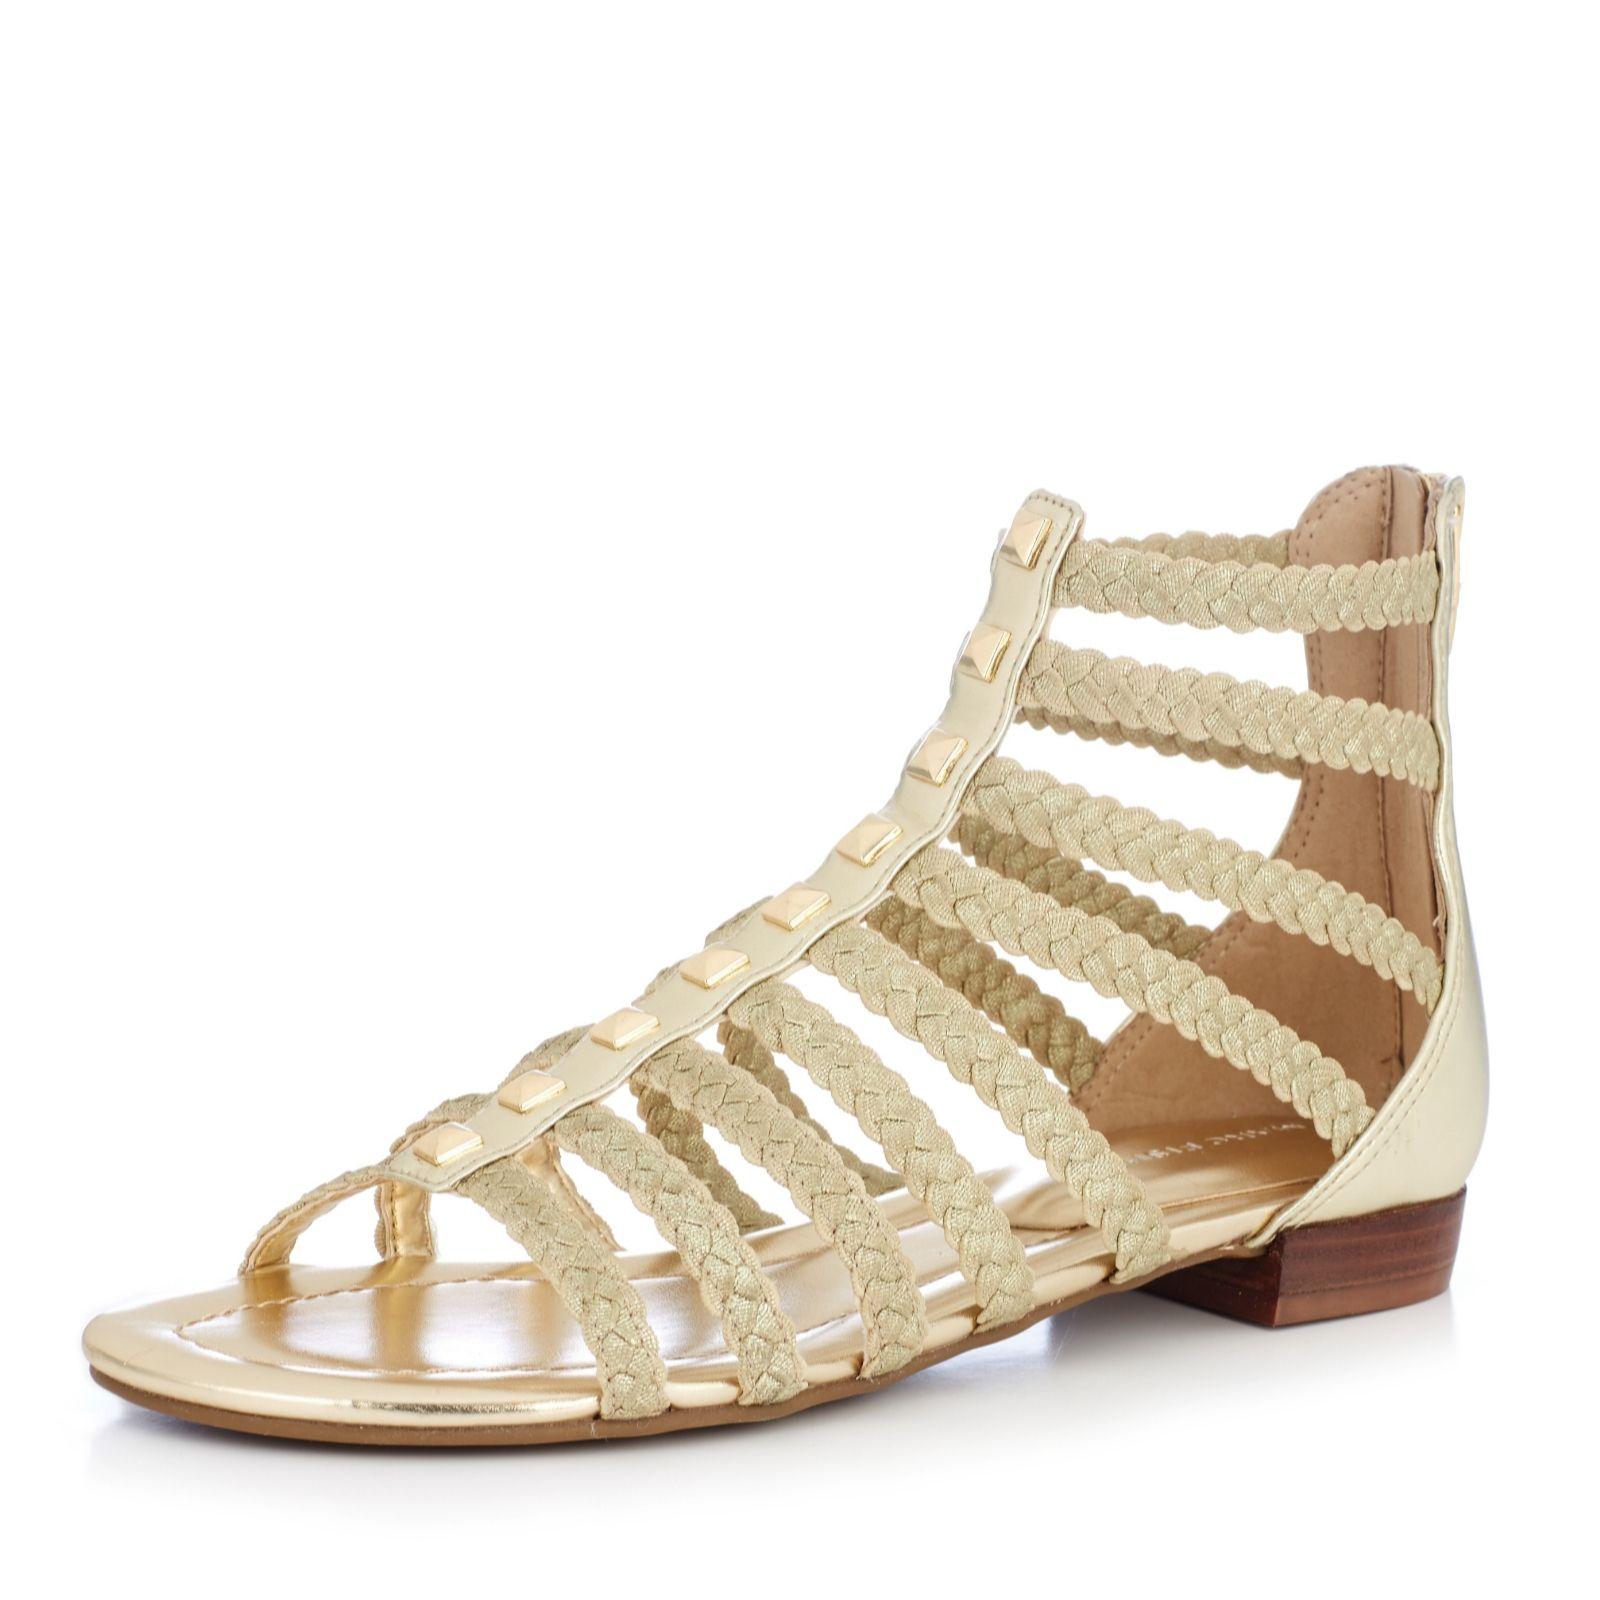 c9af4a7317da Marc Fisher Pepita Zip Back Flat Gladiator Sandal with Elasticated ...